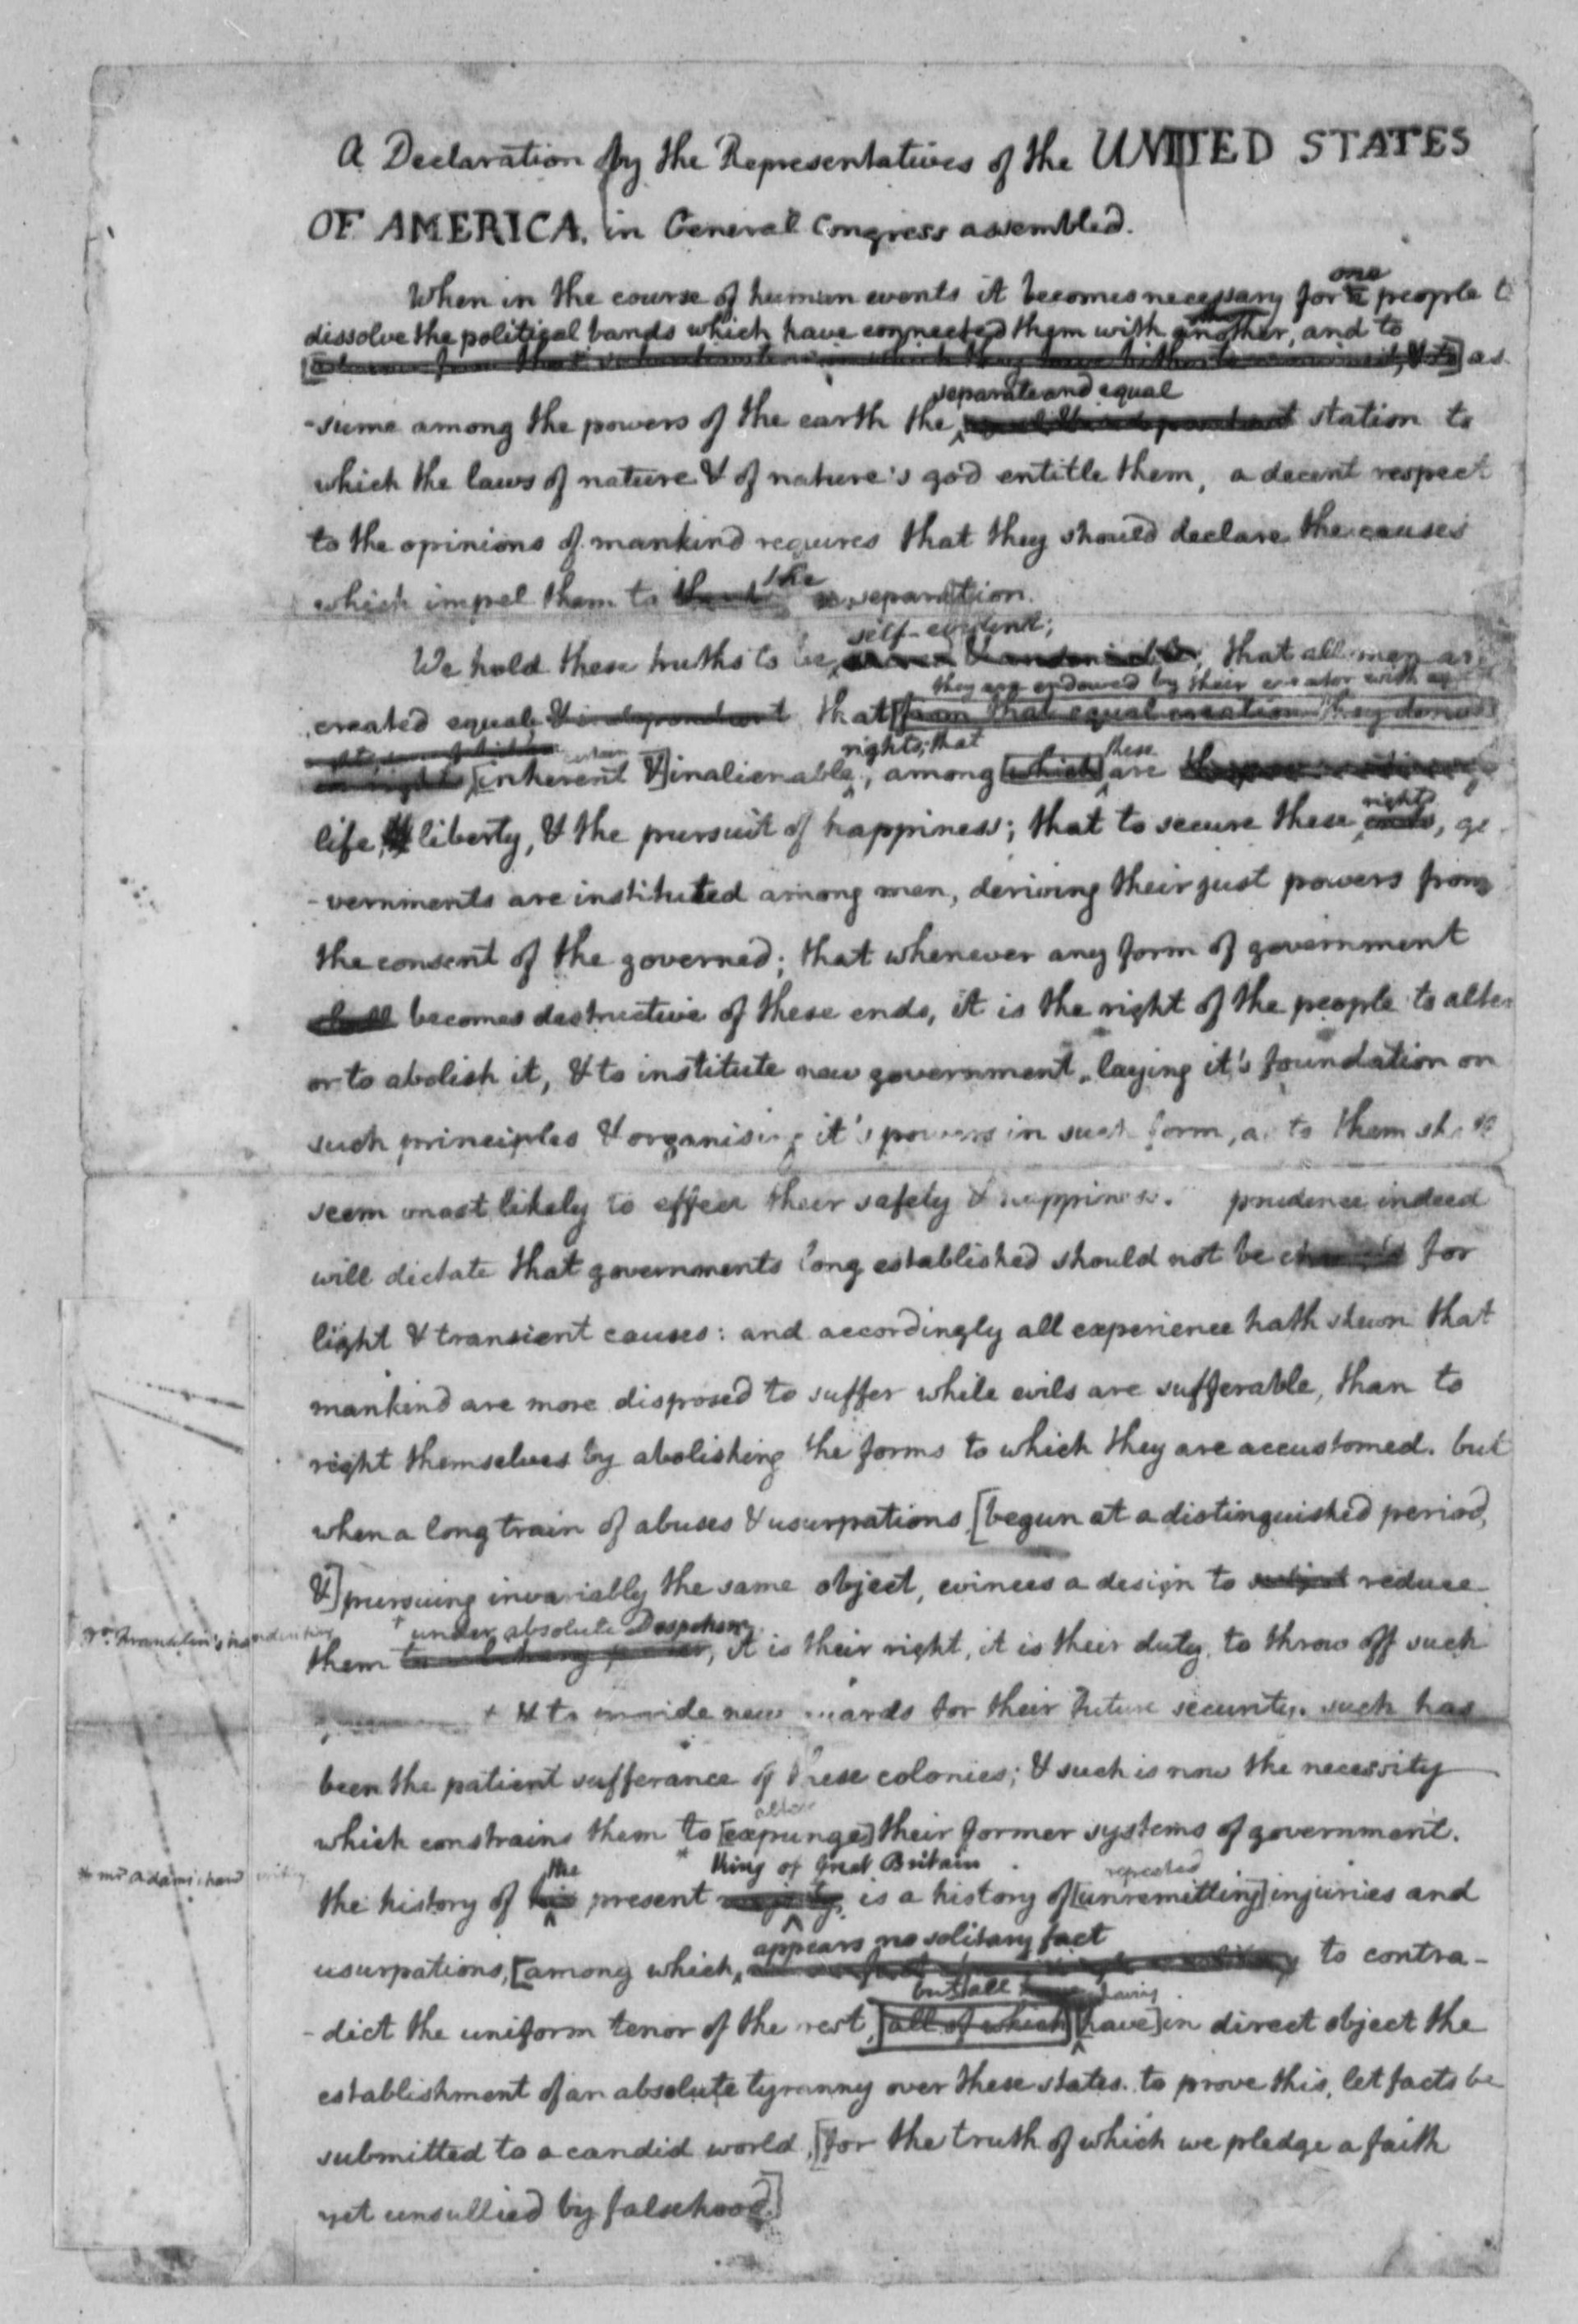 004 Thomas Jefferson Essay 3753820390 Slavery Magnificent Questions High School Sample 1920